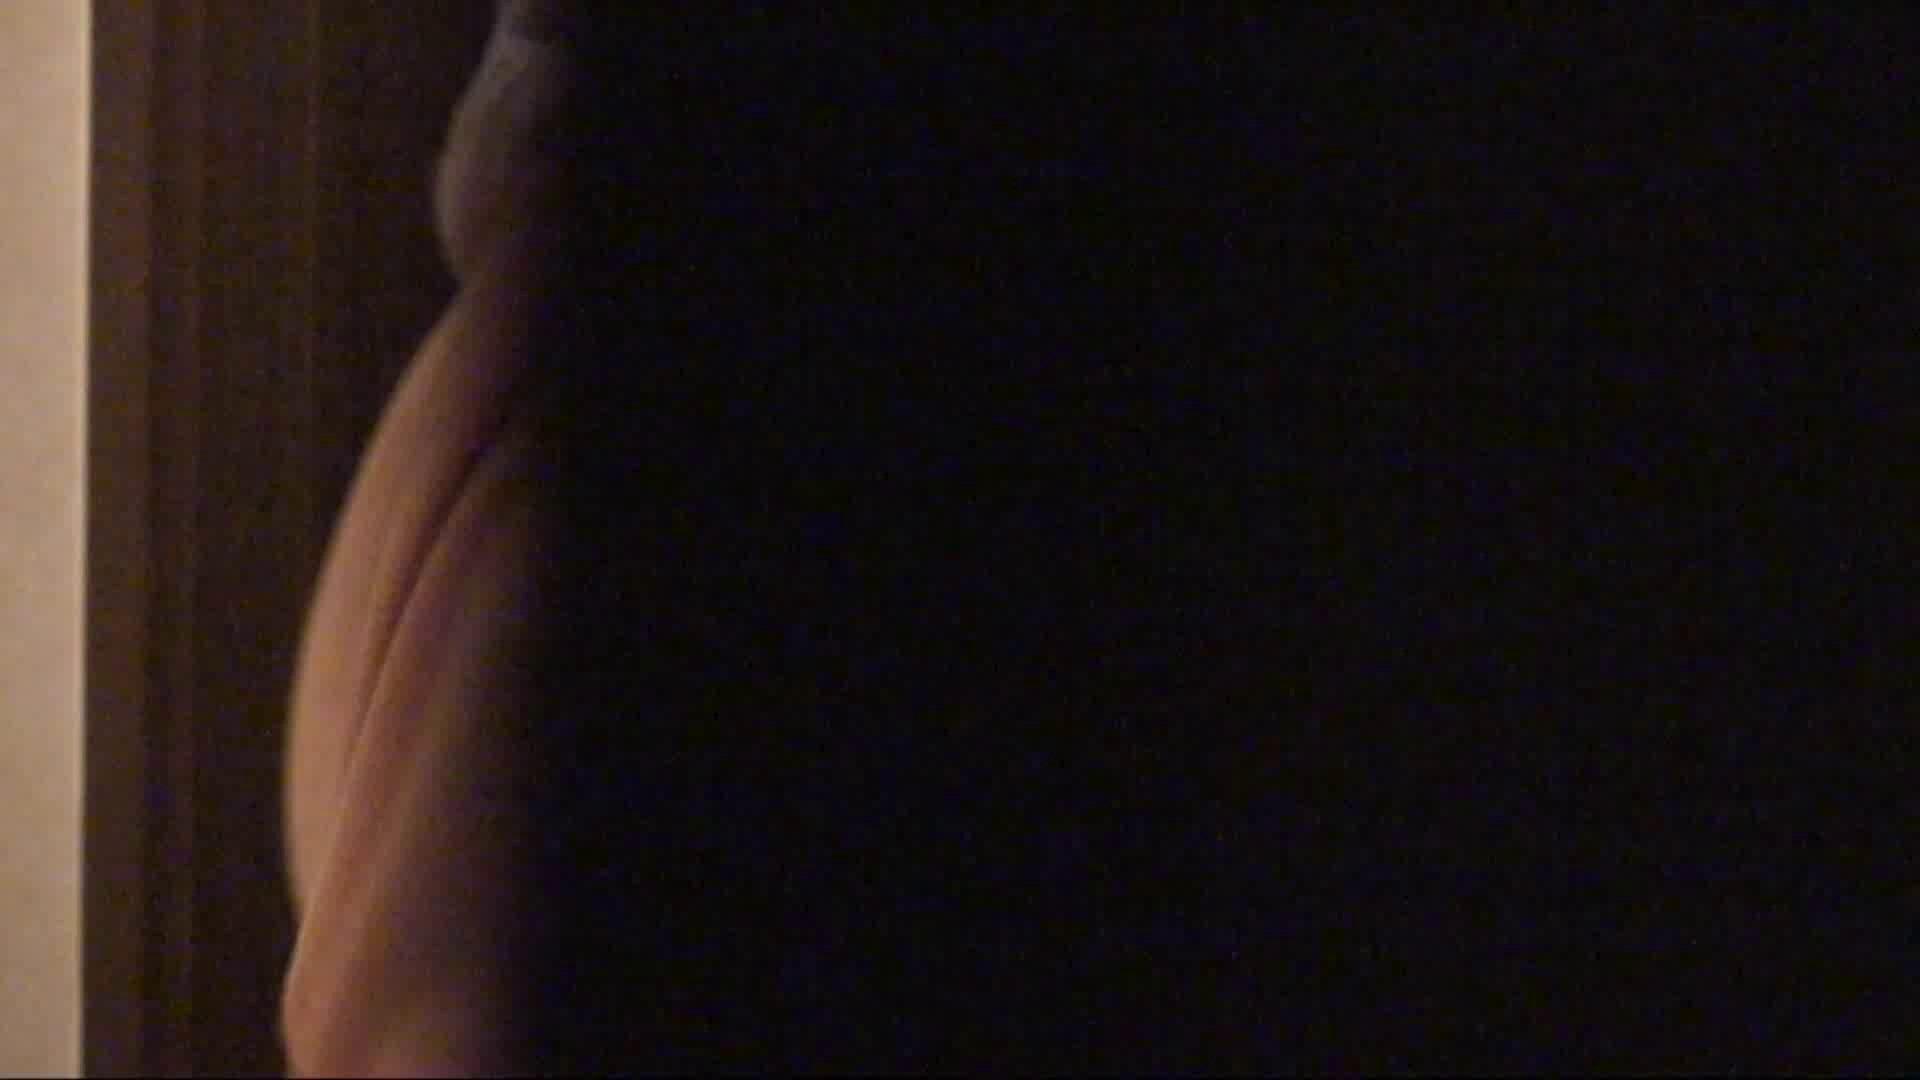 vol.02超可愛すぎる彼女の裸体をハイビジョンで!至近距離での眺め最高! 美人   民家  78pic 13